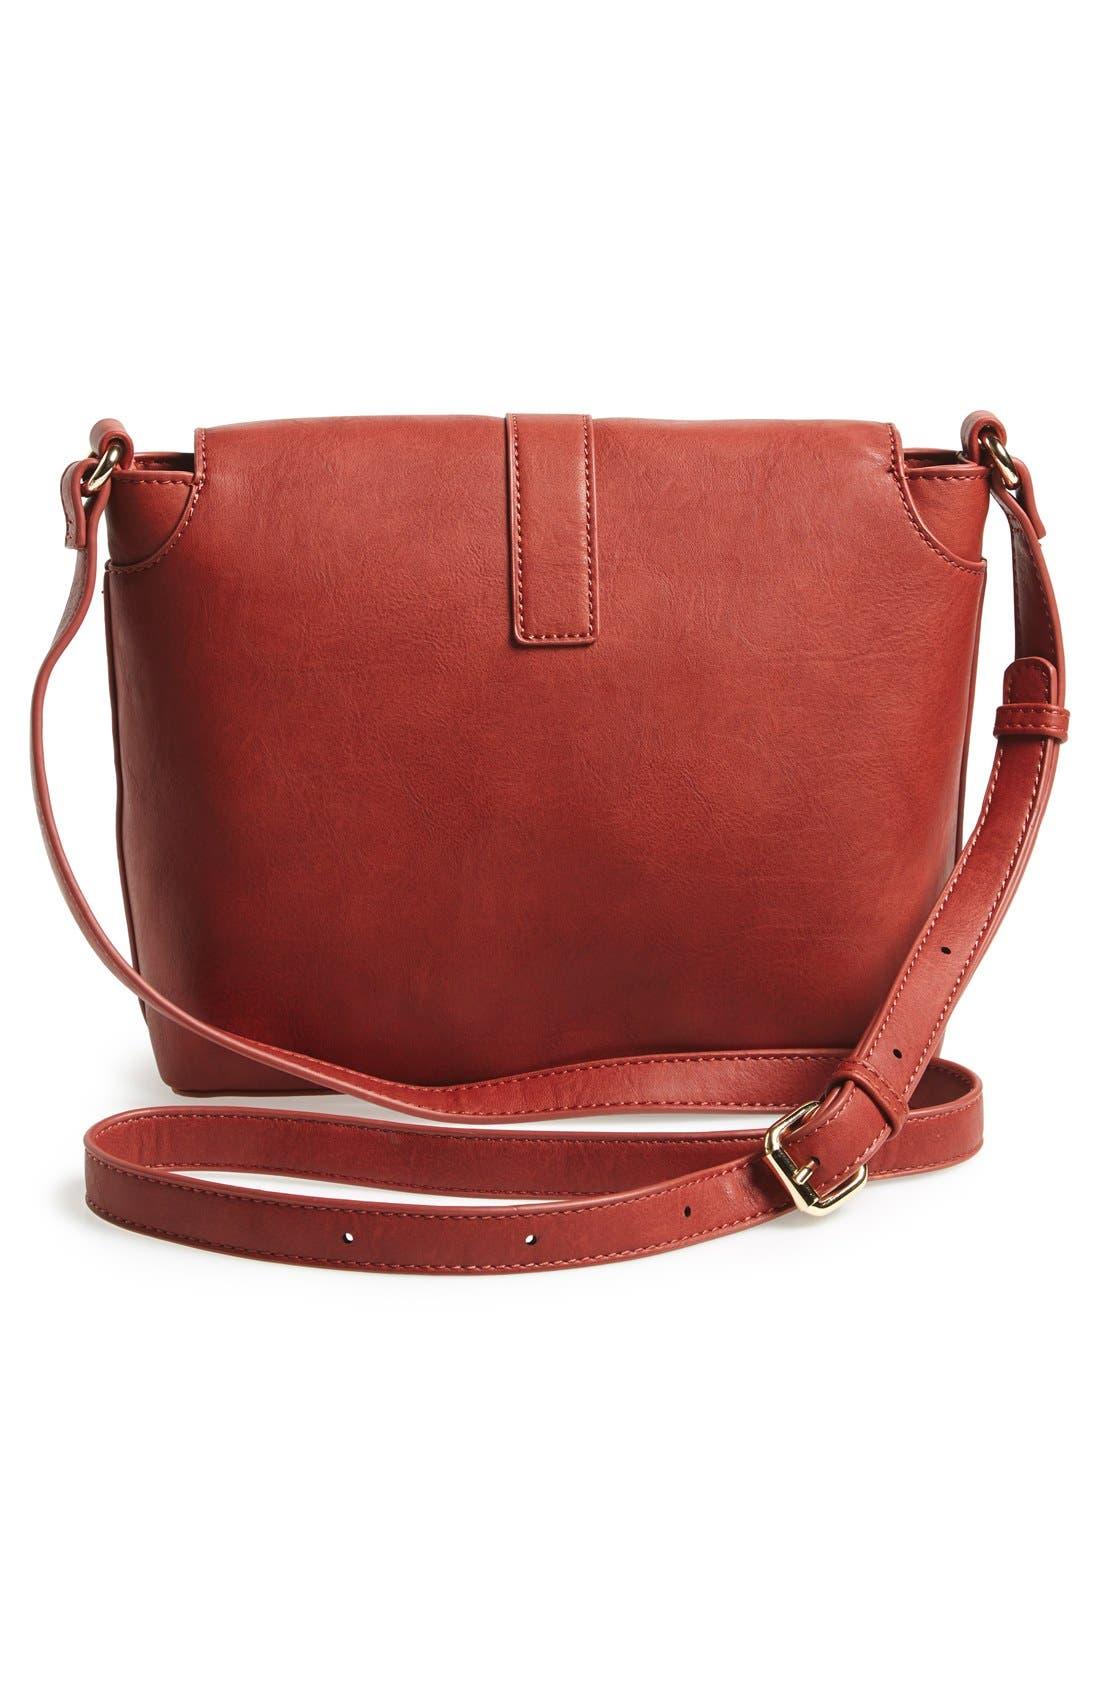 Alternate Image 3  - Sole Society 'Brady' Faux Leather Crossbody Bag